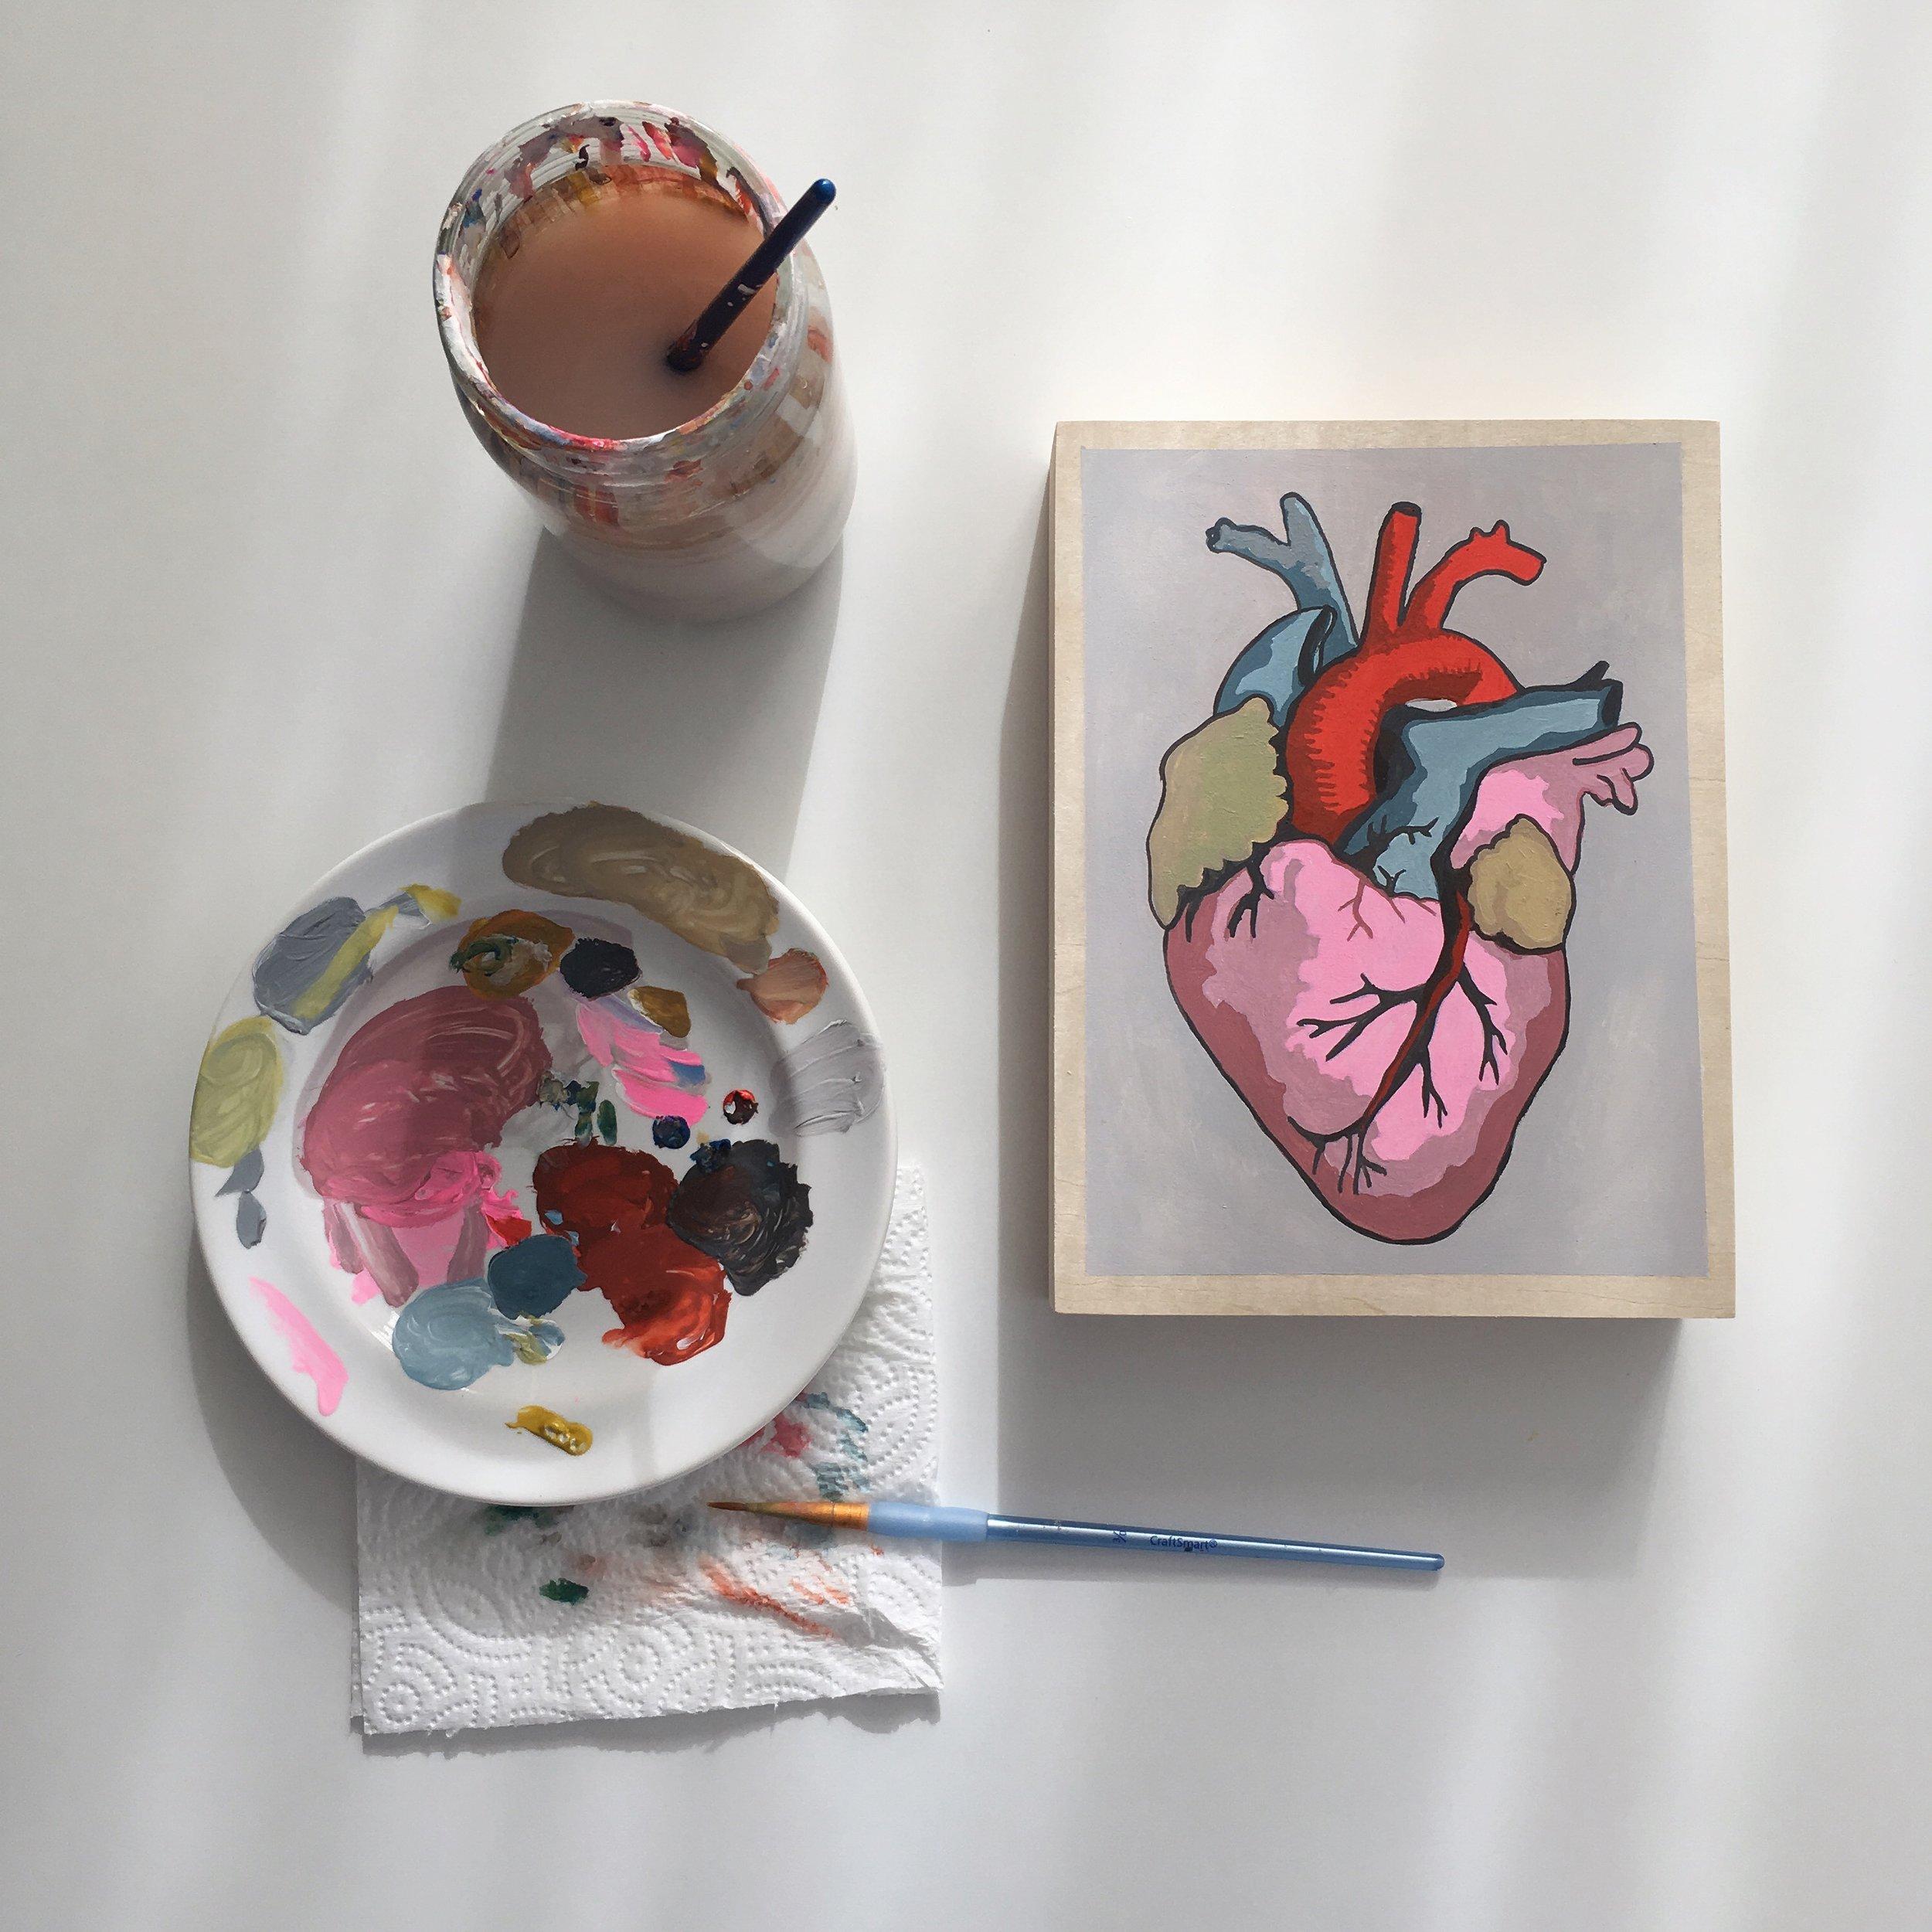 crystal moody   anatomy of a heart